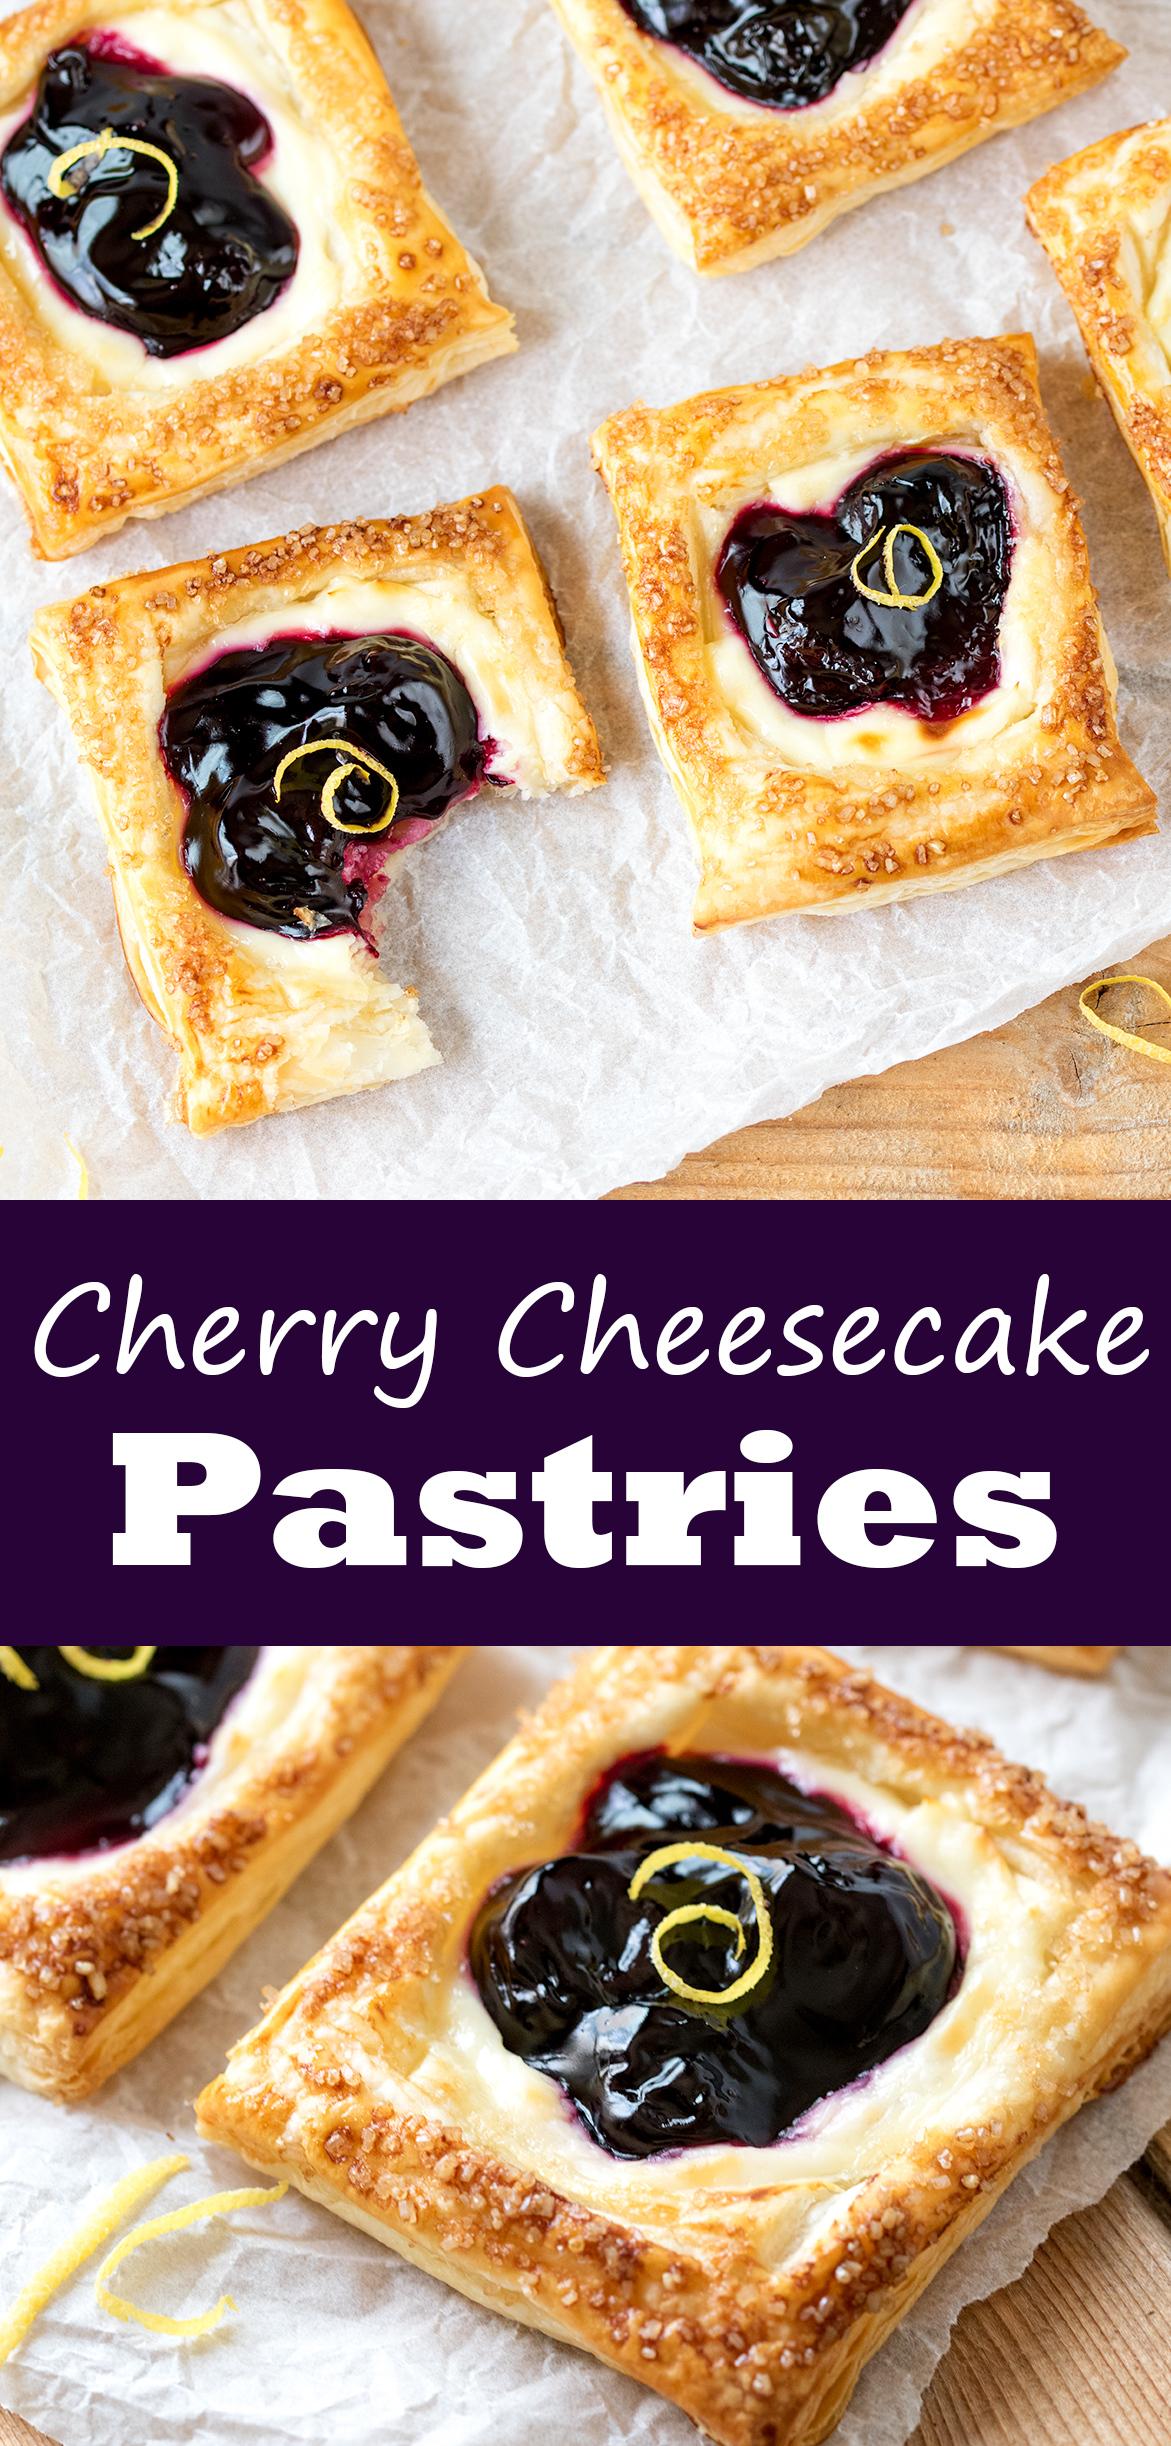 Cherry cheesecake pastries pinterest